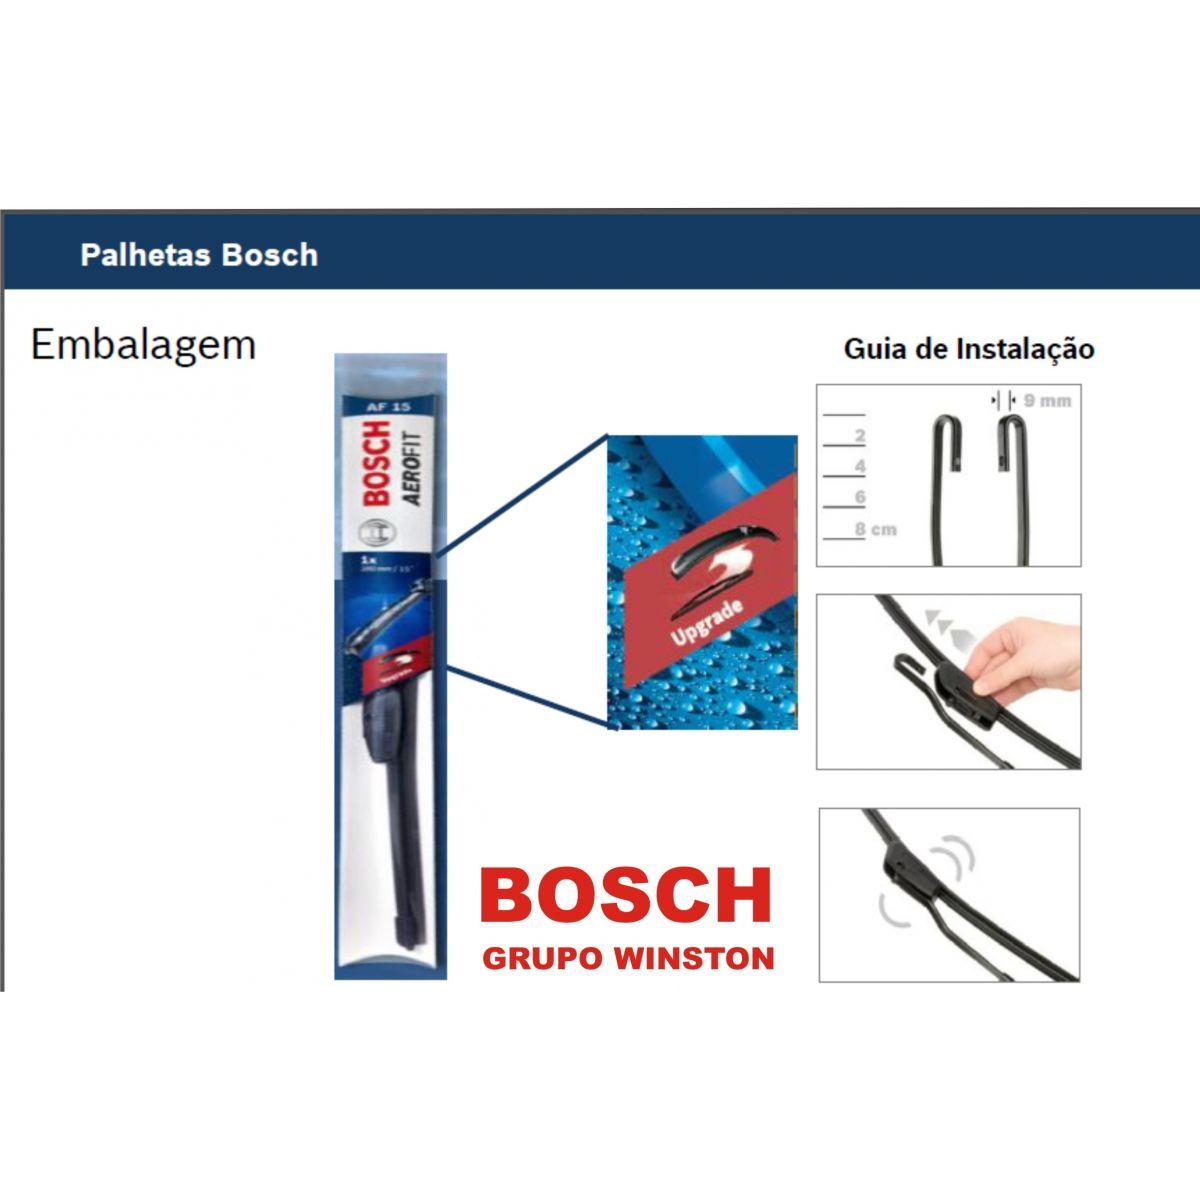 Palheta Bosch Aerofit Limpador de para brisa Bosch Chevrolet A20 / A40 / C20 / D20 Bonanza Veraneio